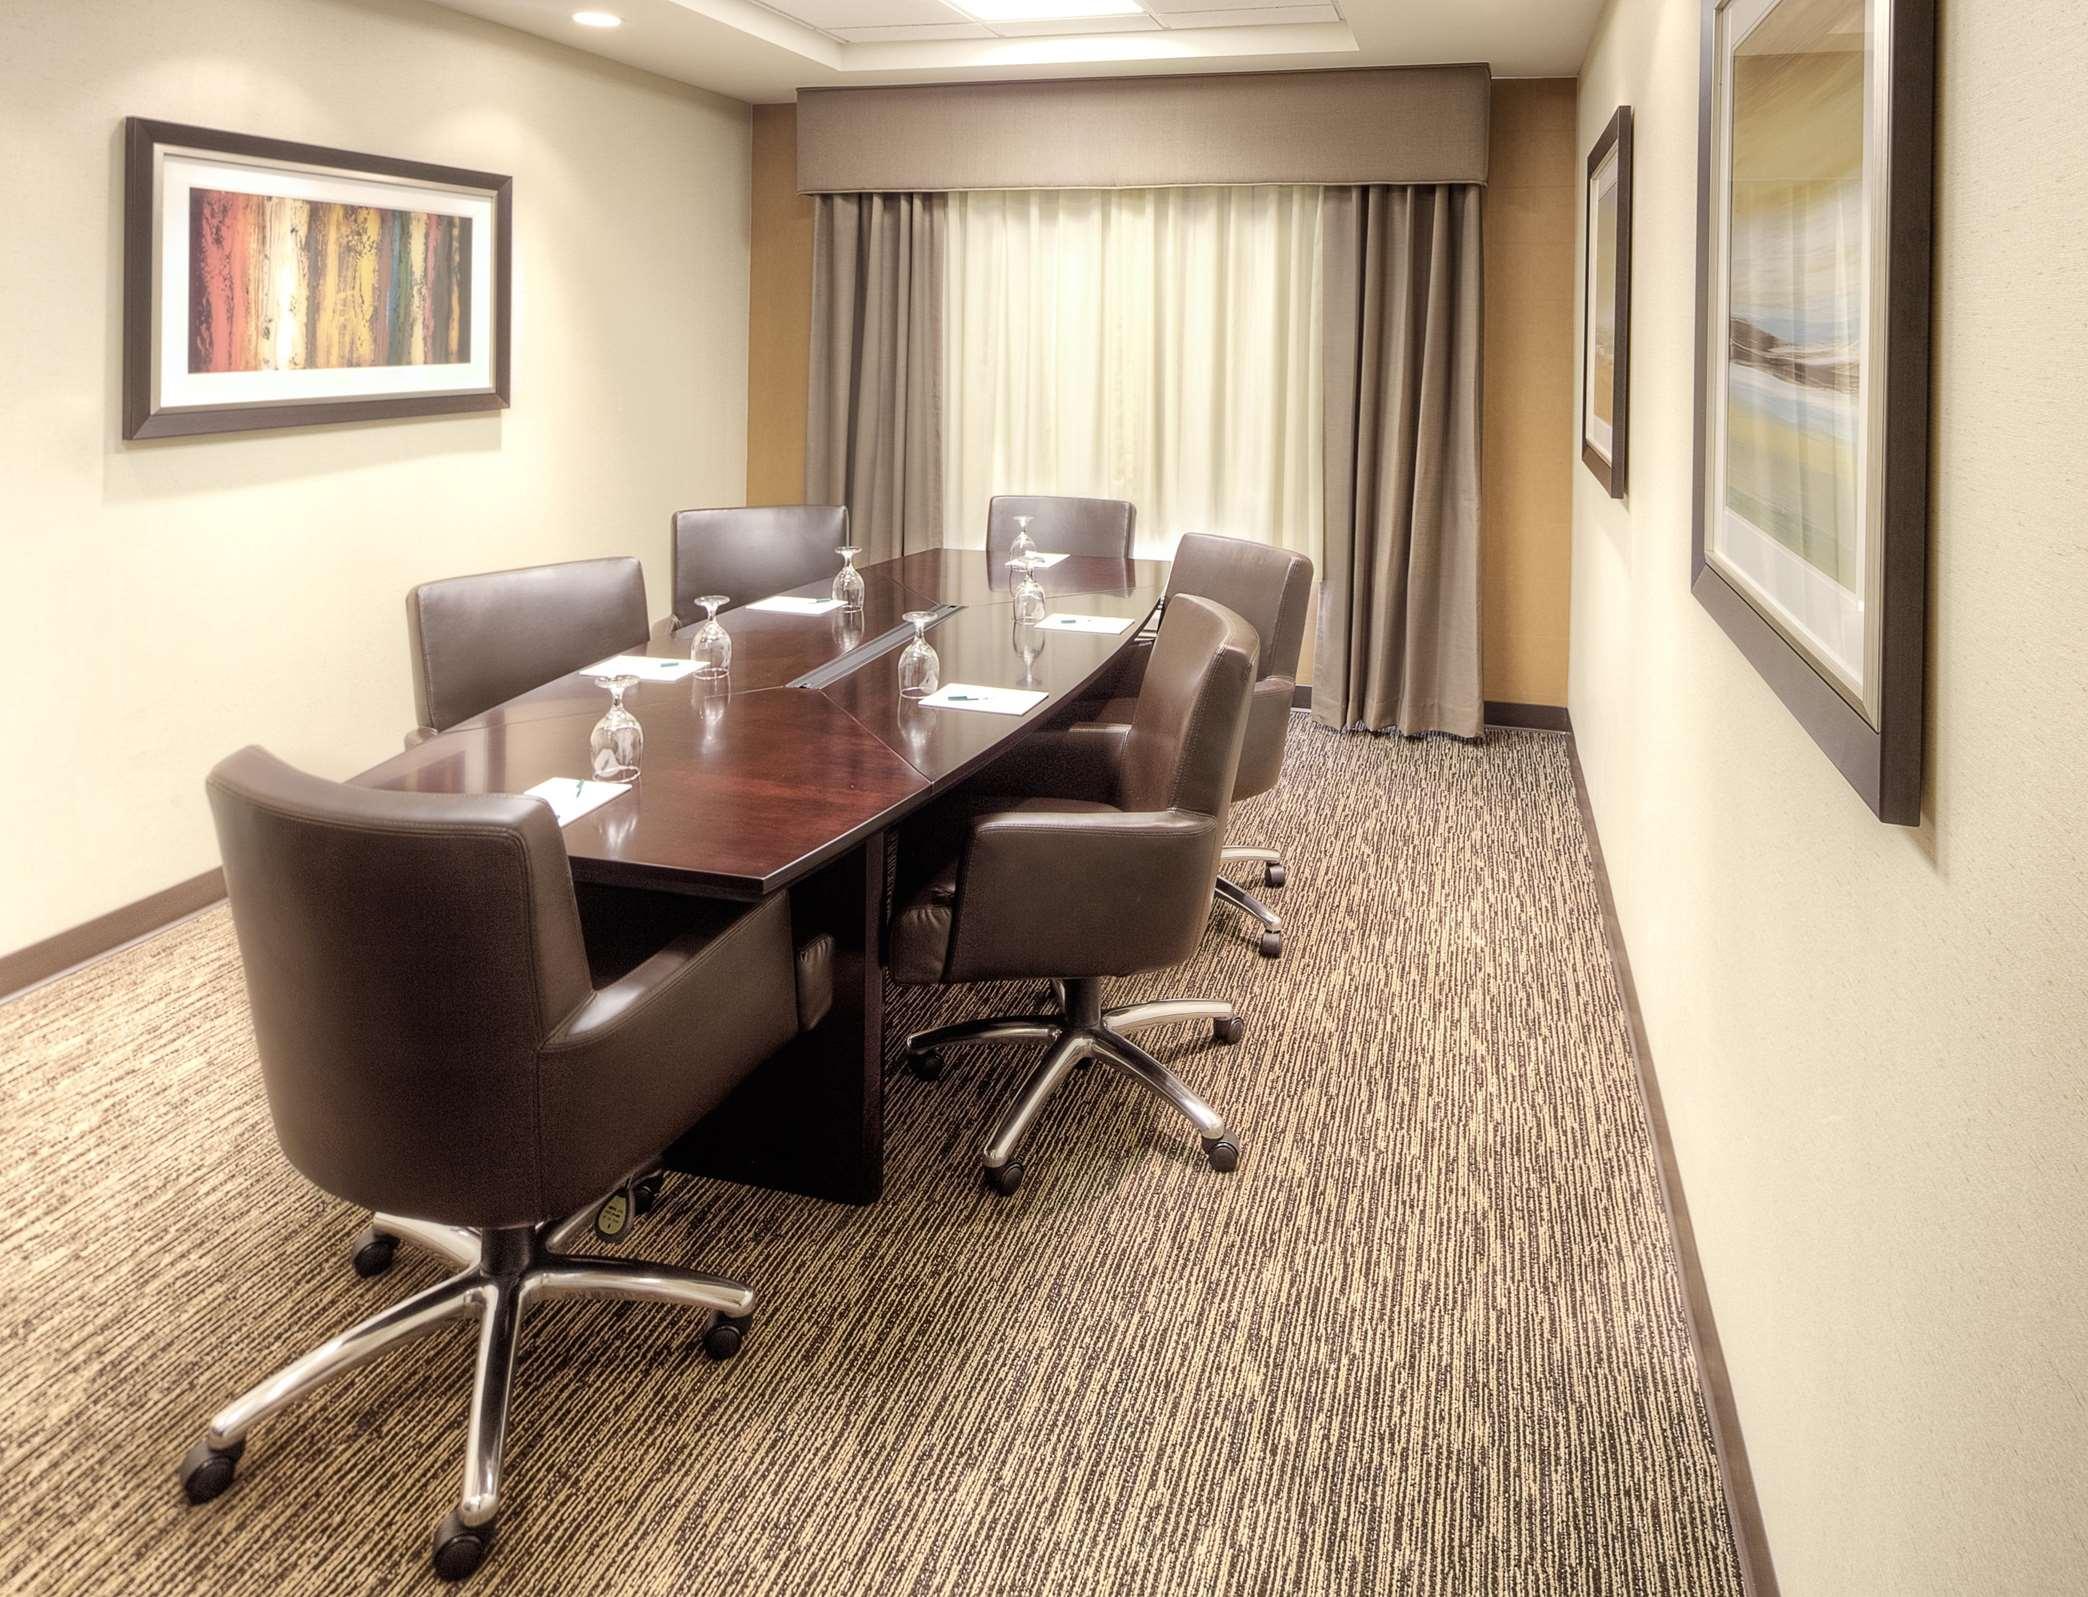 Homewood Suites by Hilton Victoria, TX image 17